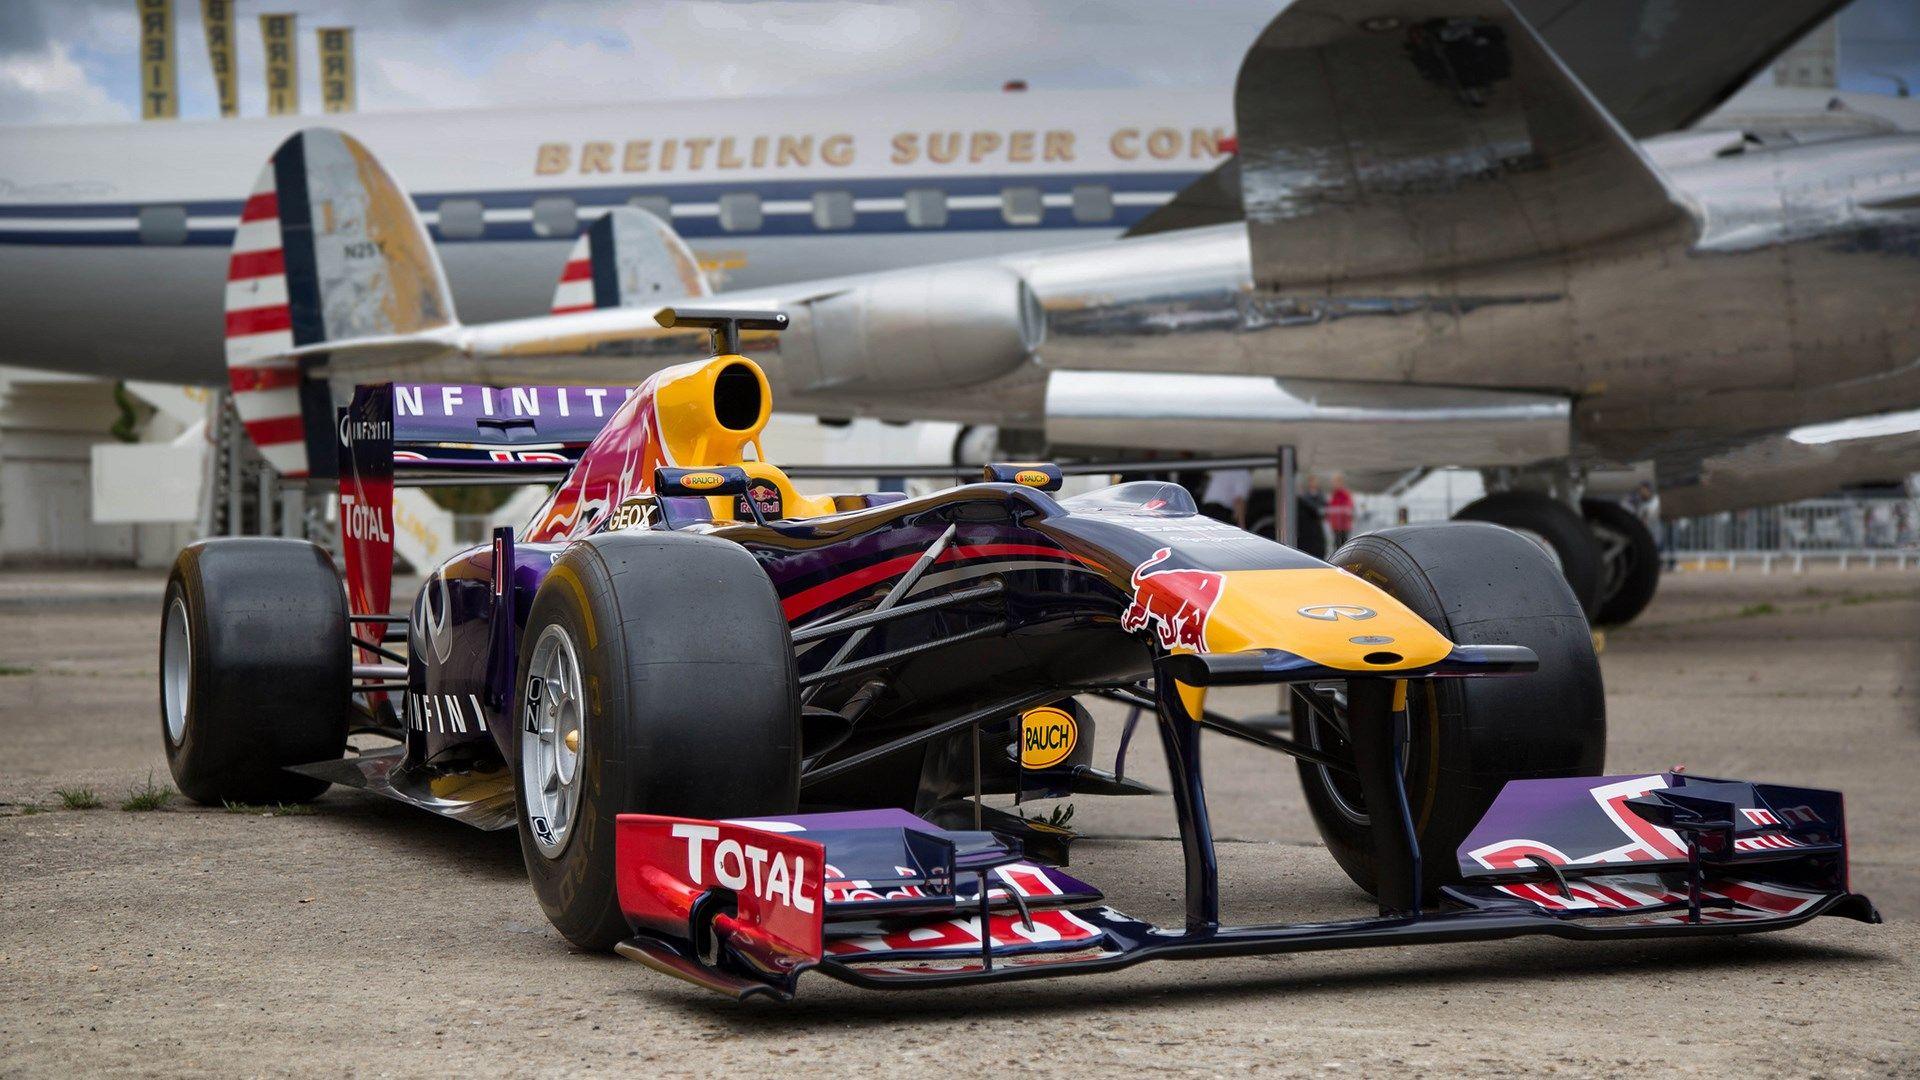 36 Fantastic <b>HD Formula 1 Wallpapers</b> - HDWallSource.com